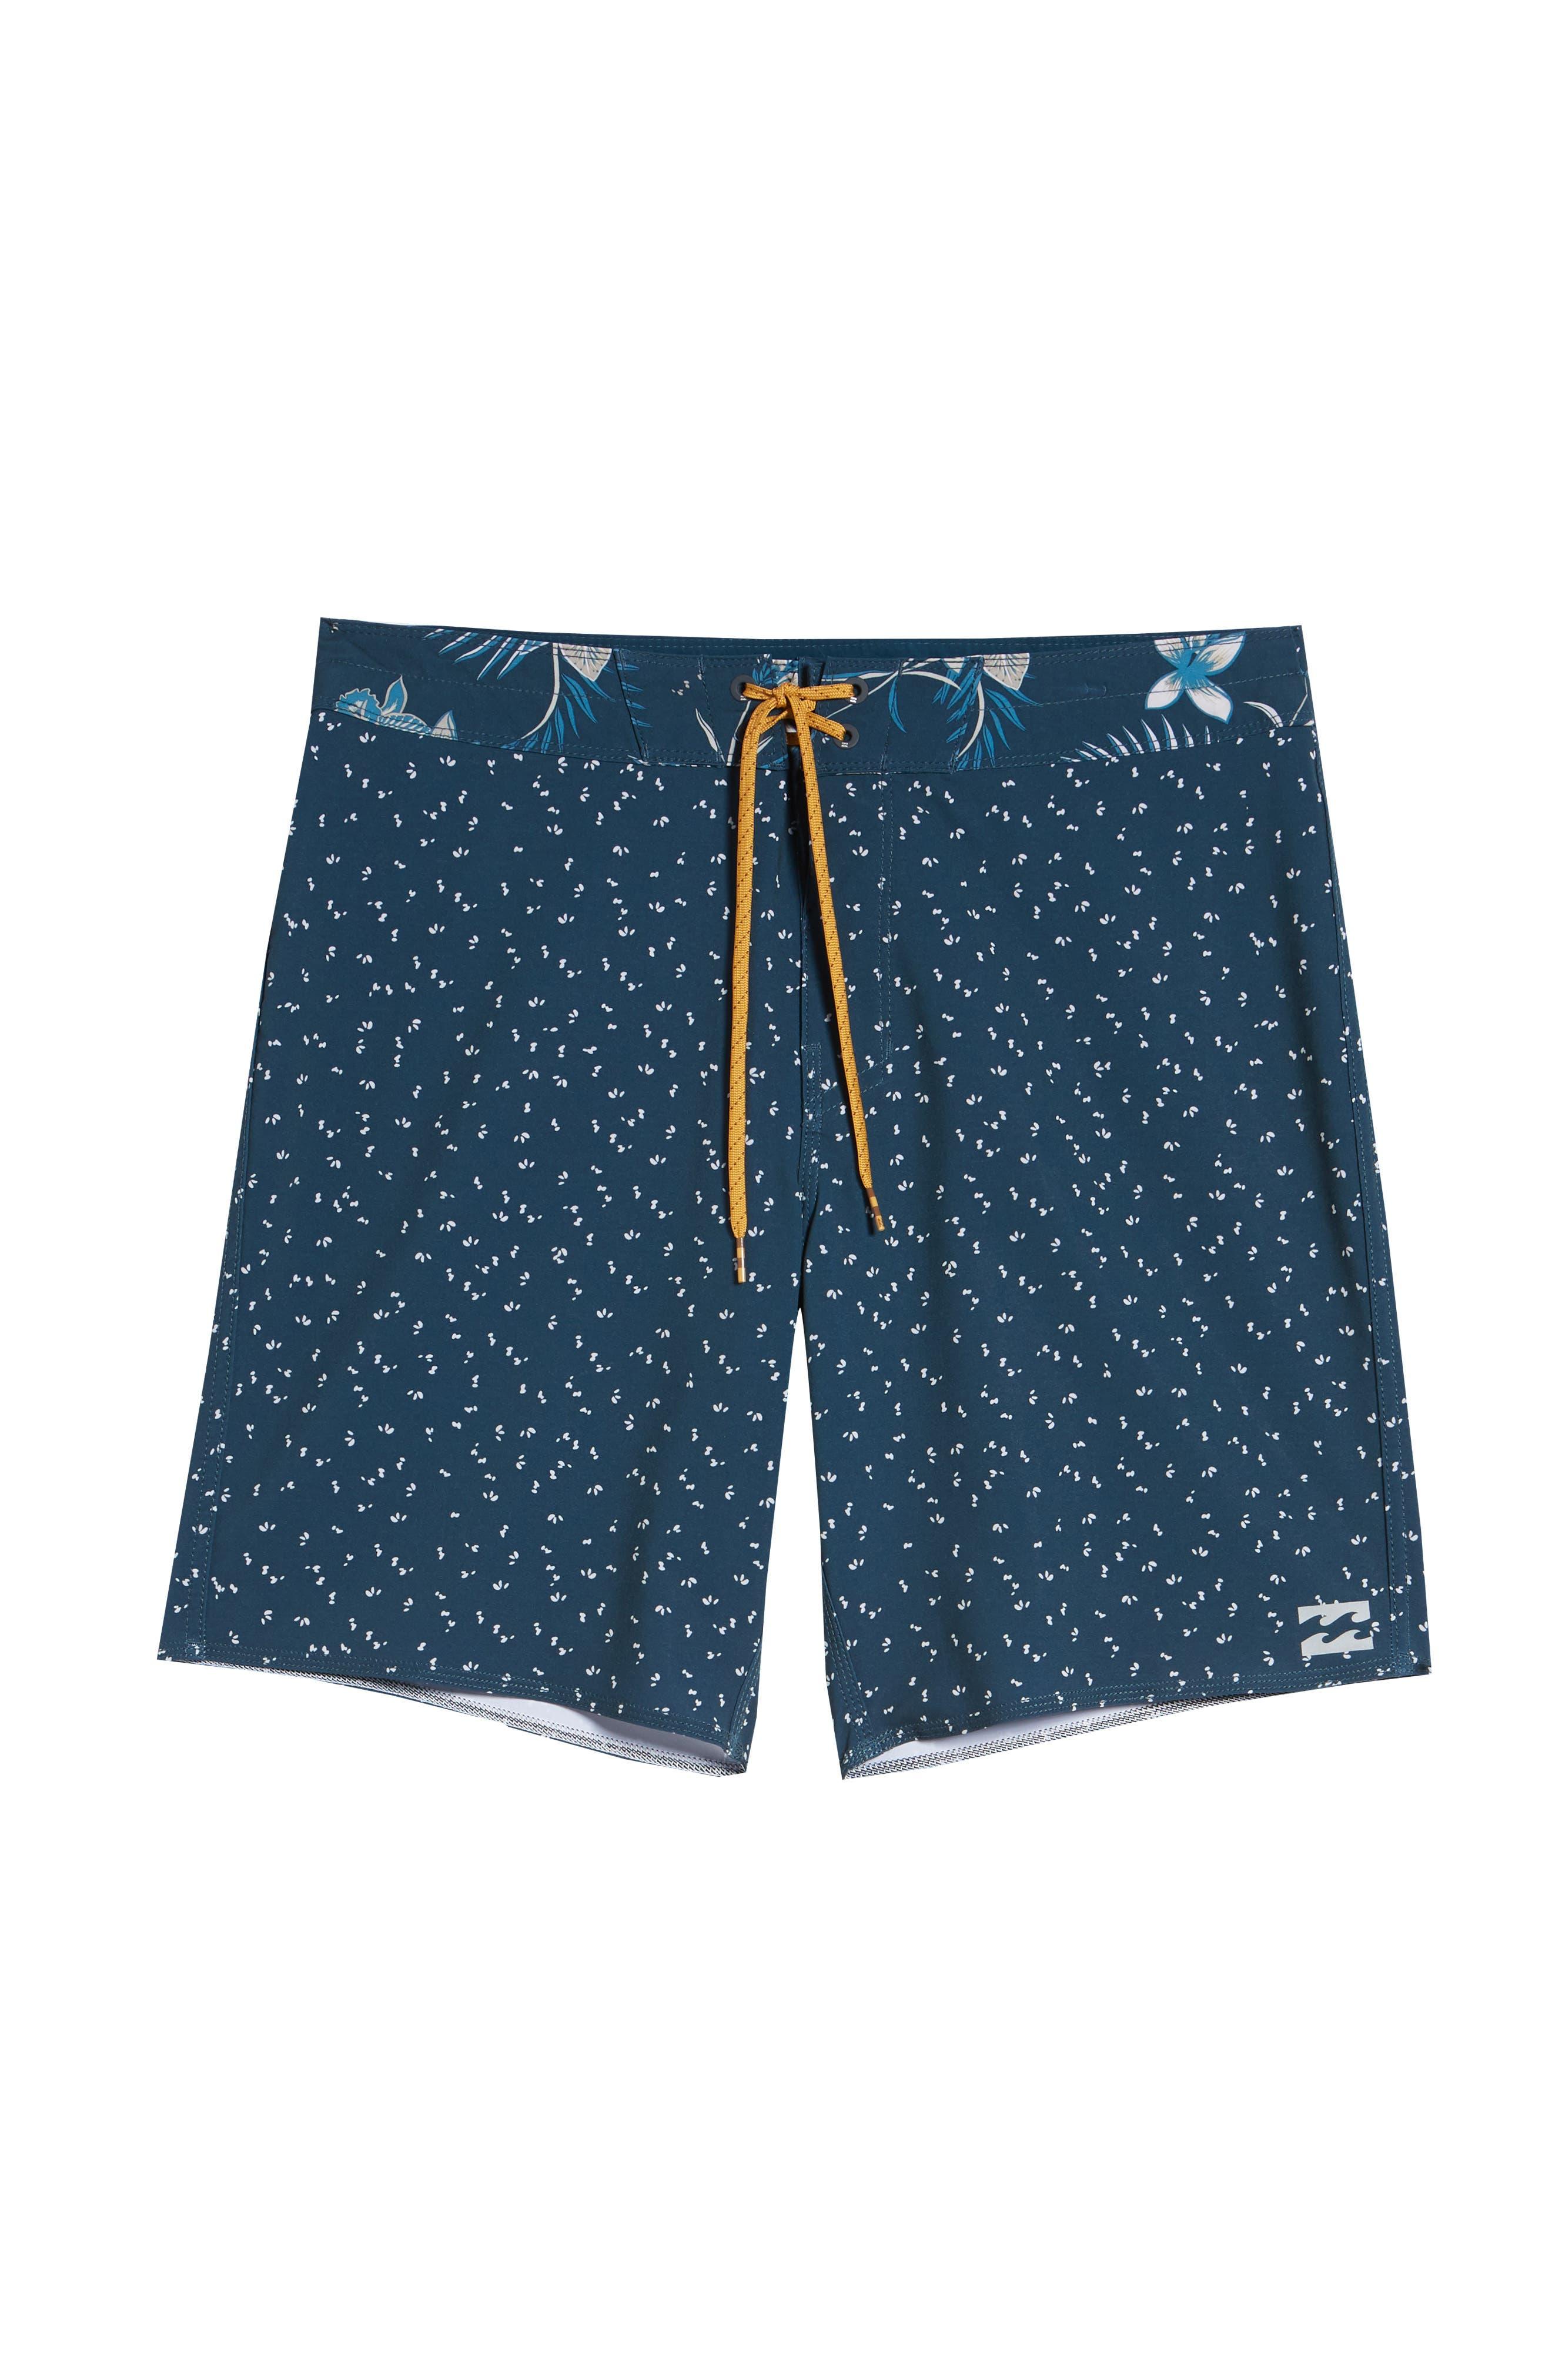 Sundays X Board Shorts,                             Alternate thumbnail 4, color,                             Indigo